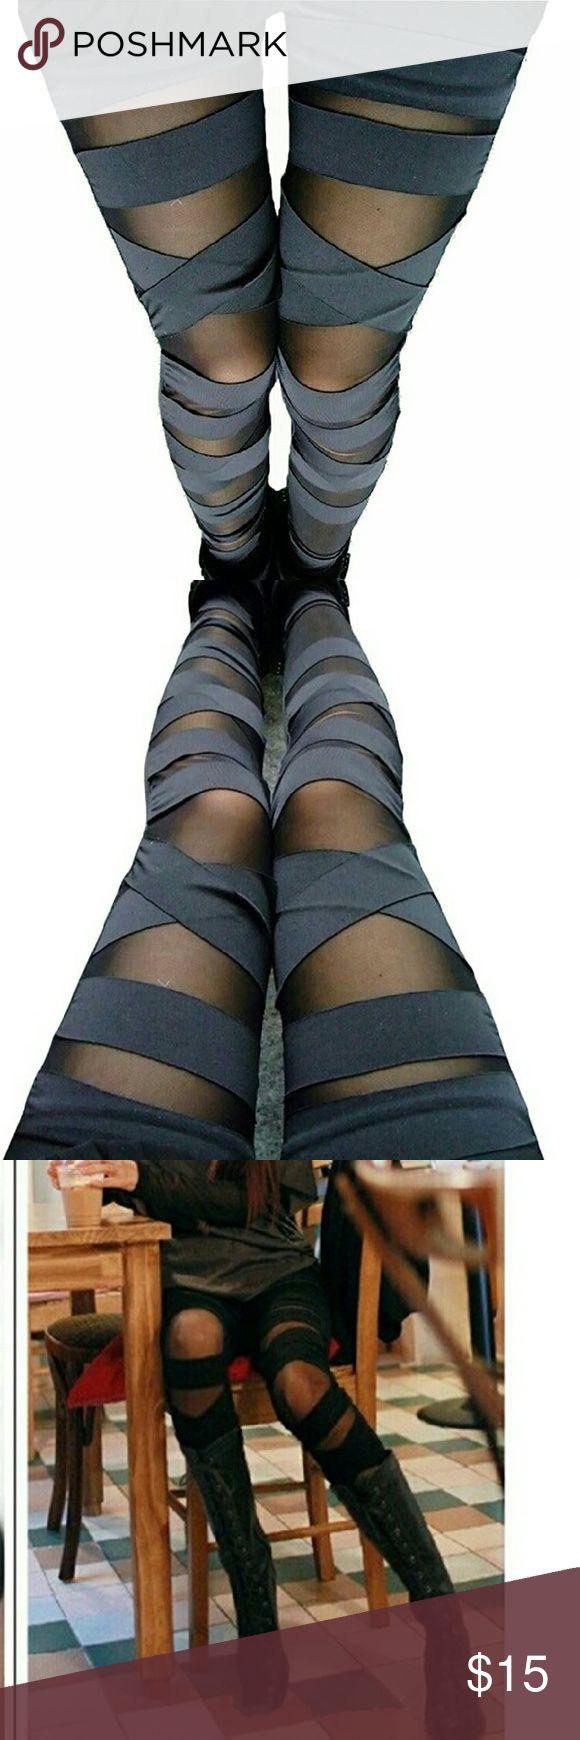 NWT Partial See Through Wrapped Leggings. NWT Partially See Through Leggings with Criss Cross Wrapped detail. Black mesh. Elastic. Pants Leggings